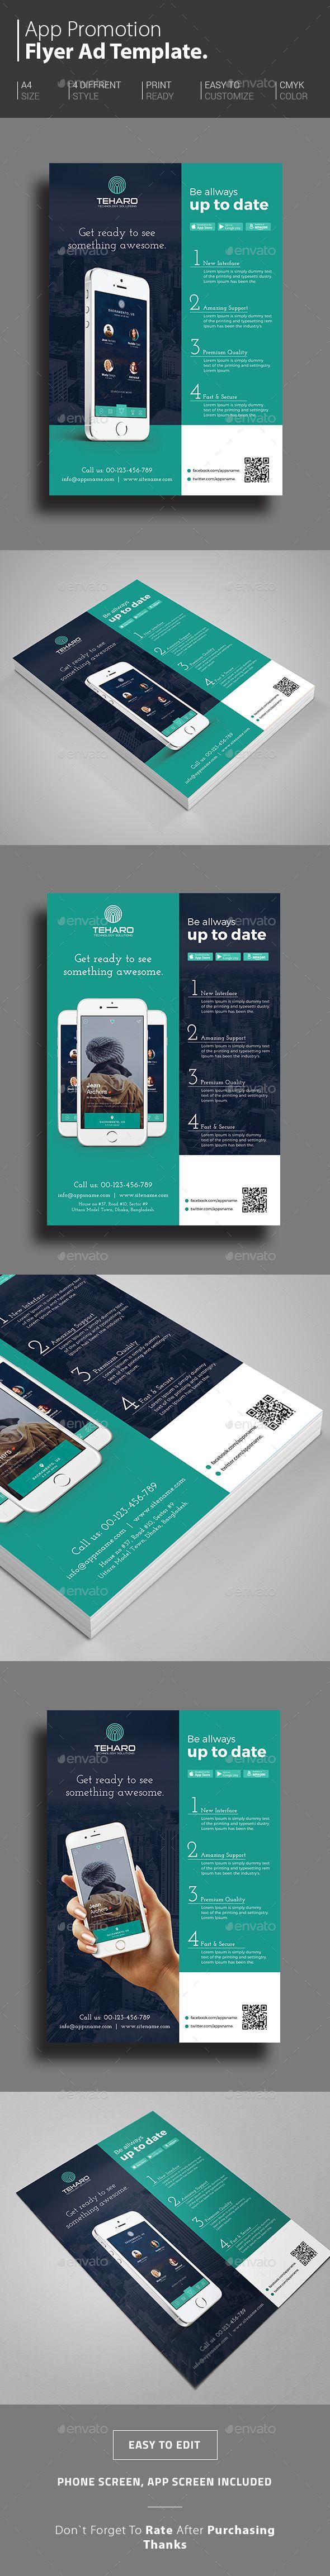 App Promotional Flyer Template PSD. Download here: http://graphicriver.net/item/app-promotional-flyer/14779975?ref=ksioks